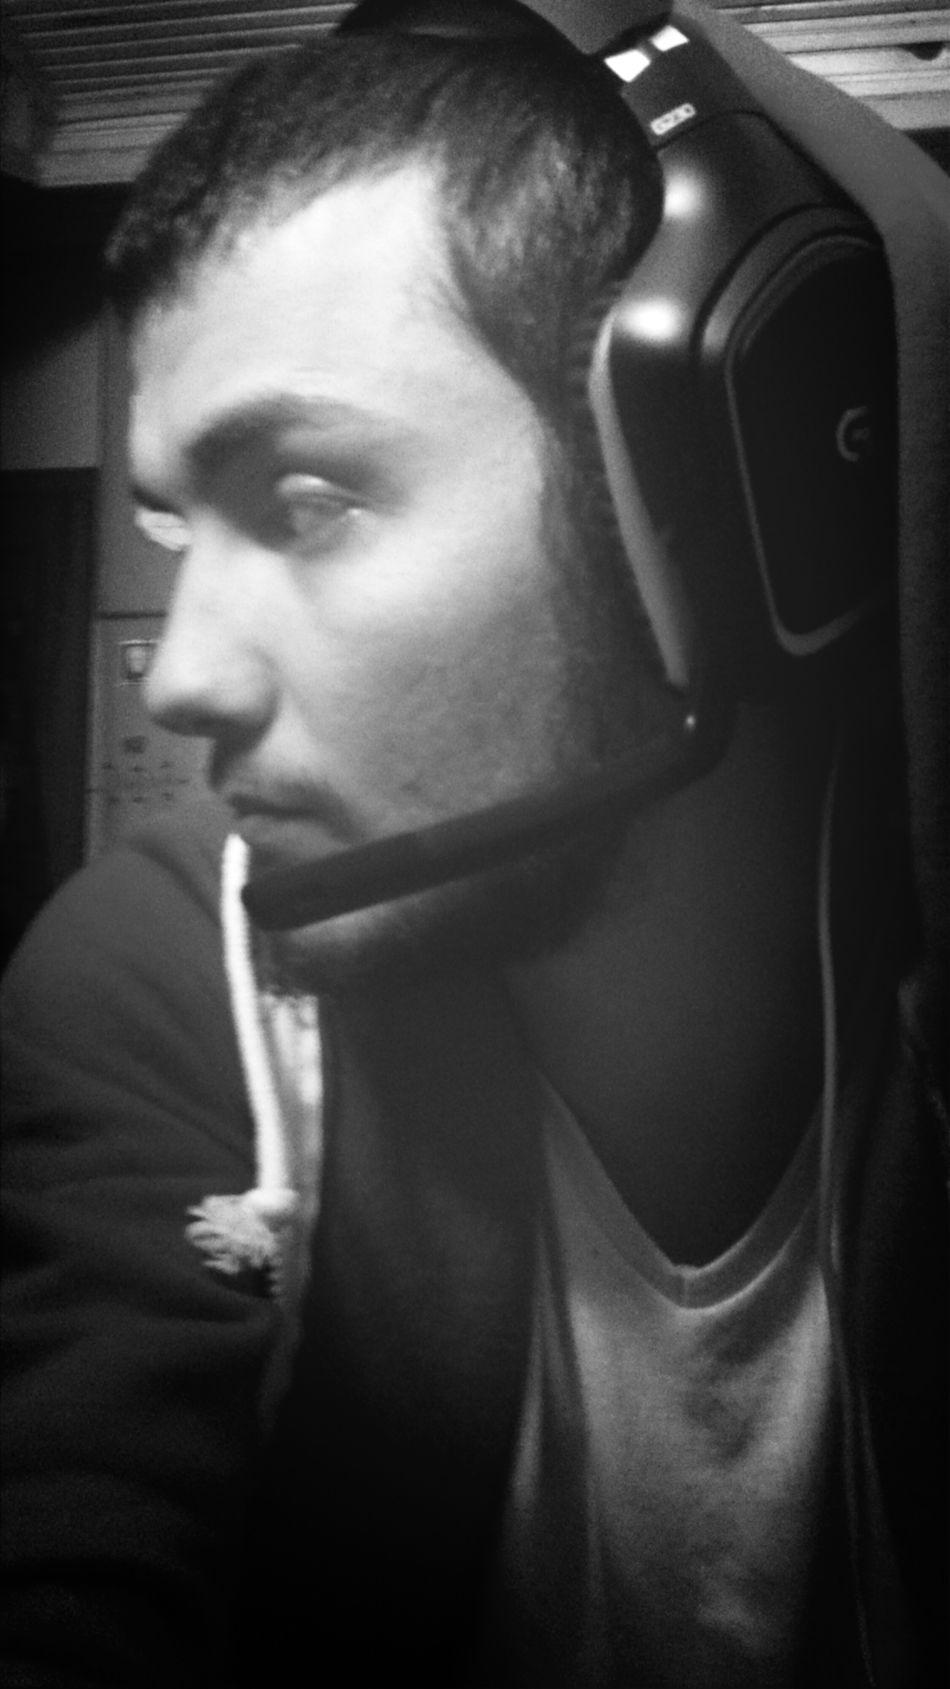 Oyun oynarken rahatsız edildiğimde ben :) Logitech G230 Home Gamer Blackandwhite